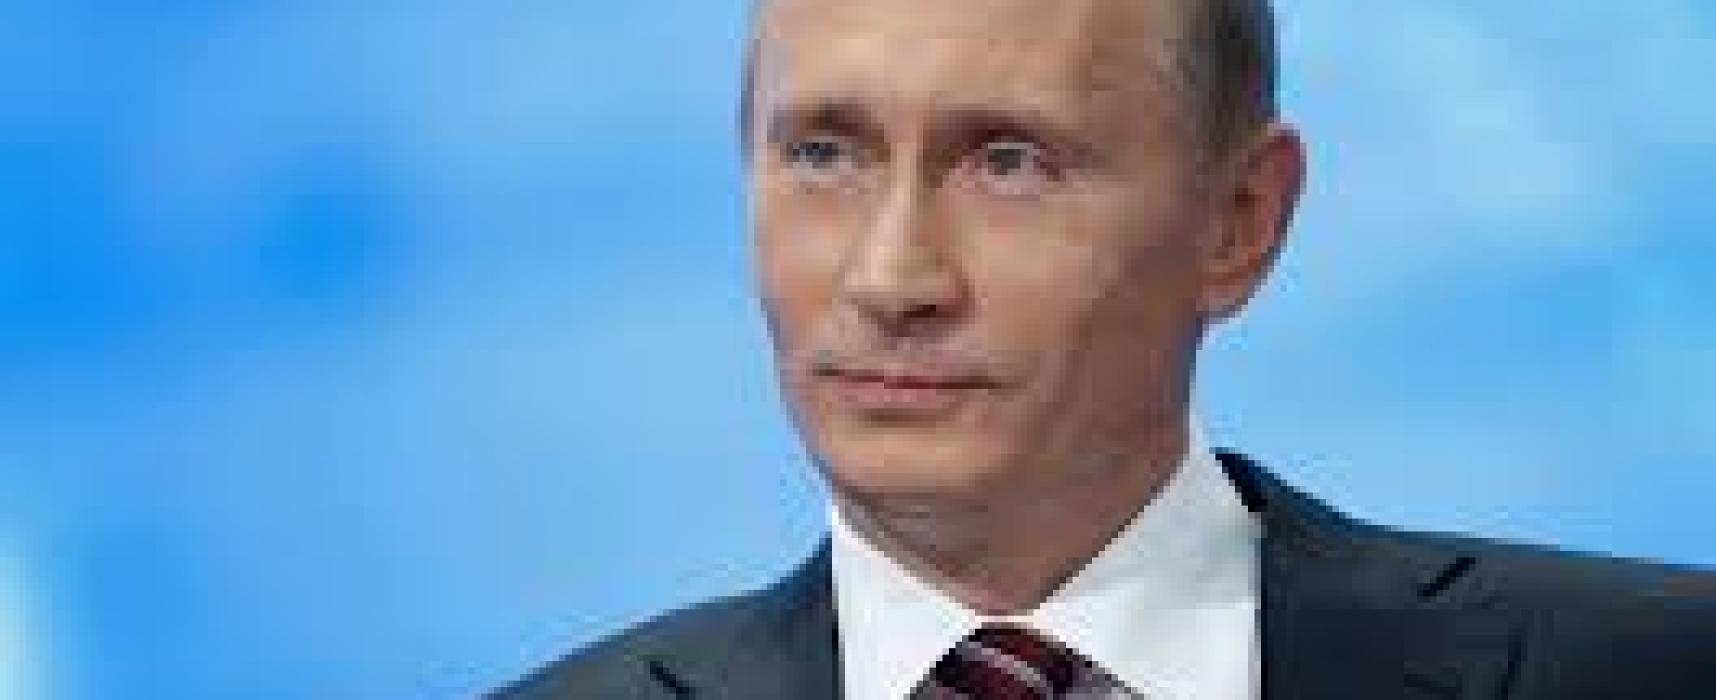 Putin says Russia won't be intimidated over Crimea